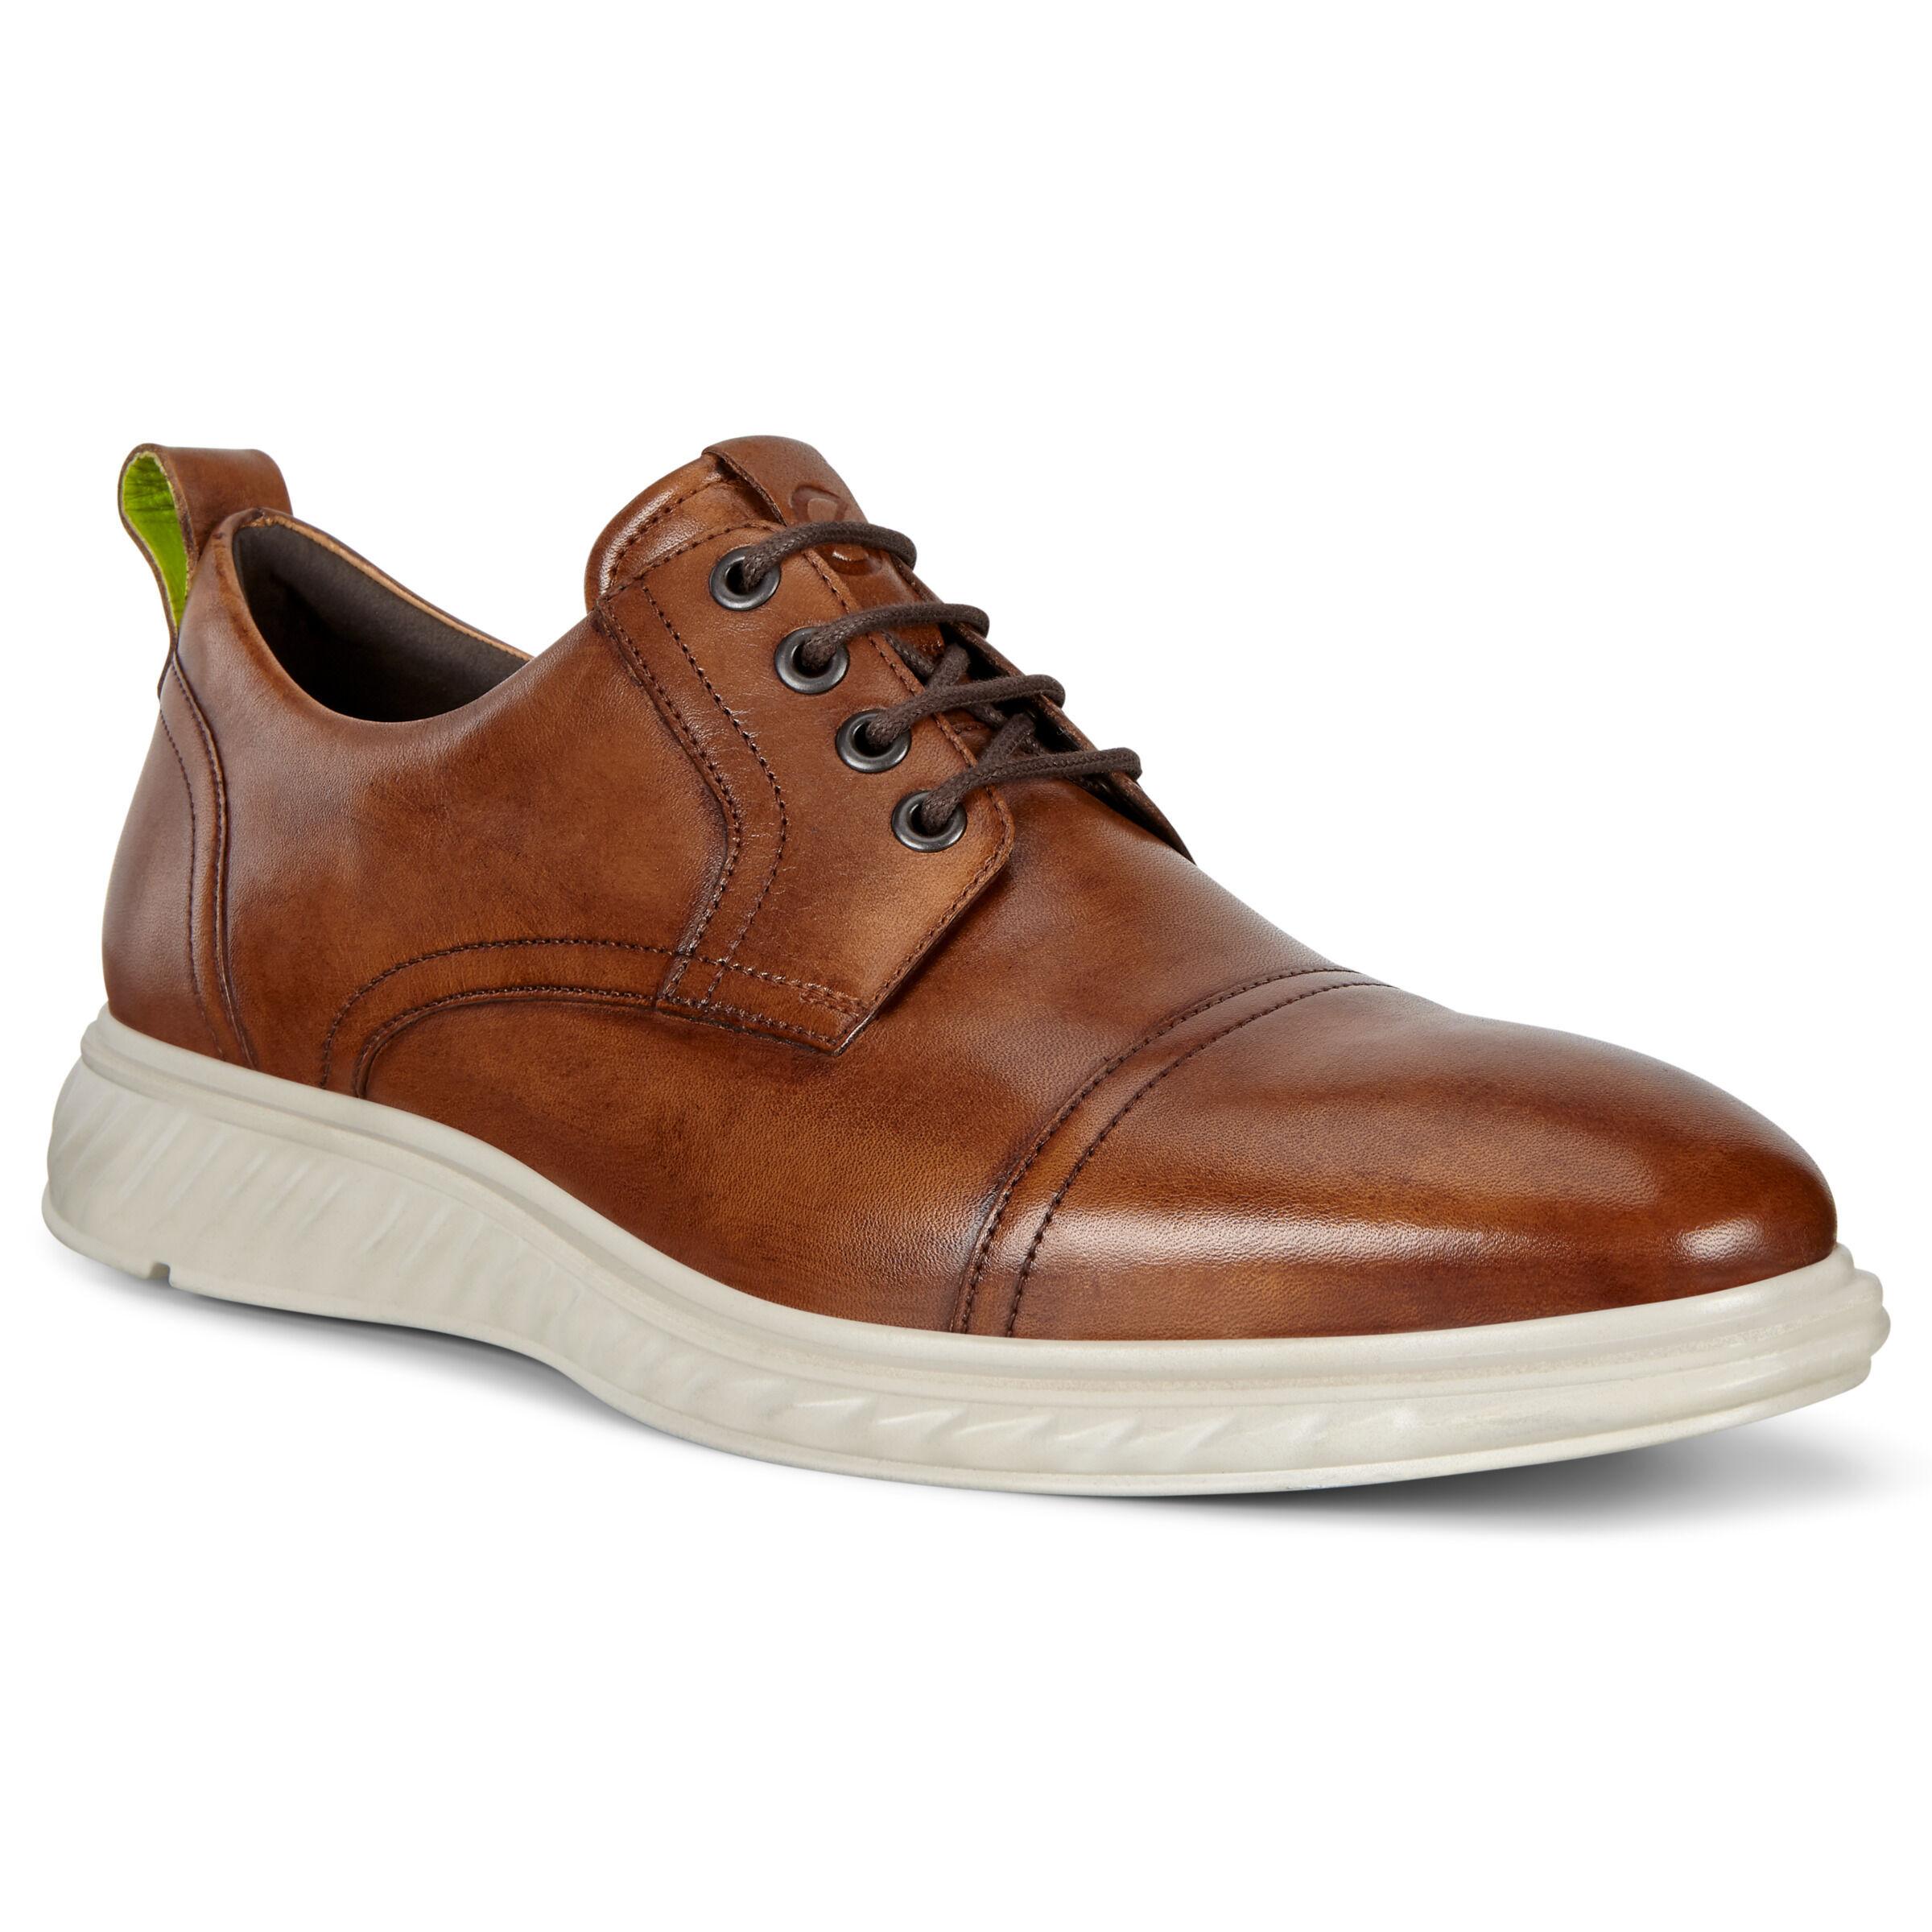 ECCO St. 1 Hybrid Lite Mens Shoes: 10 - Amber